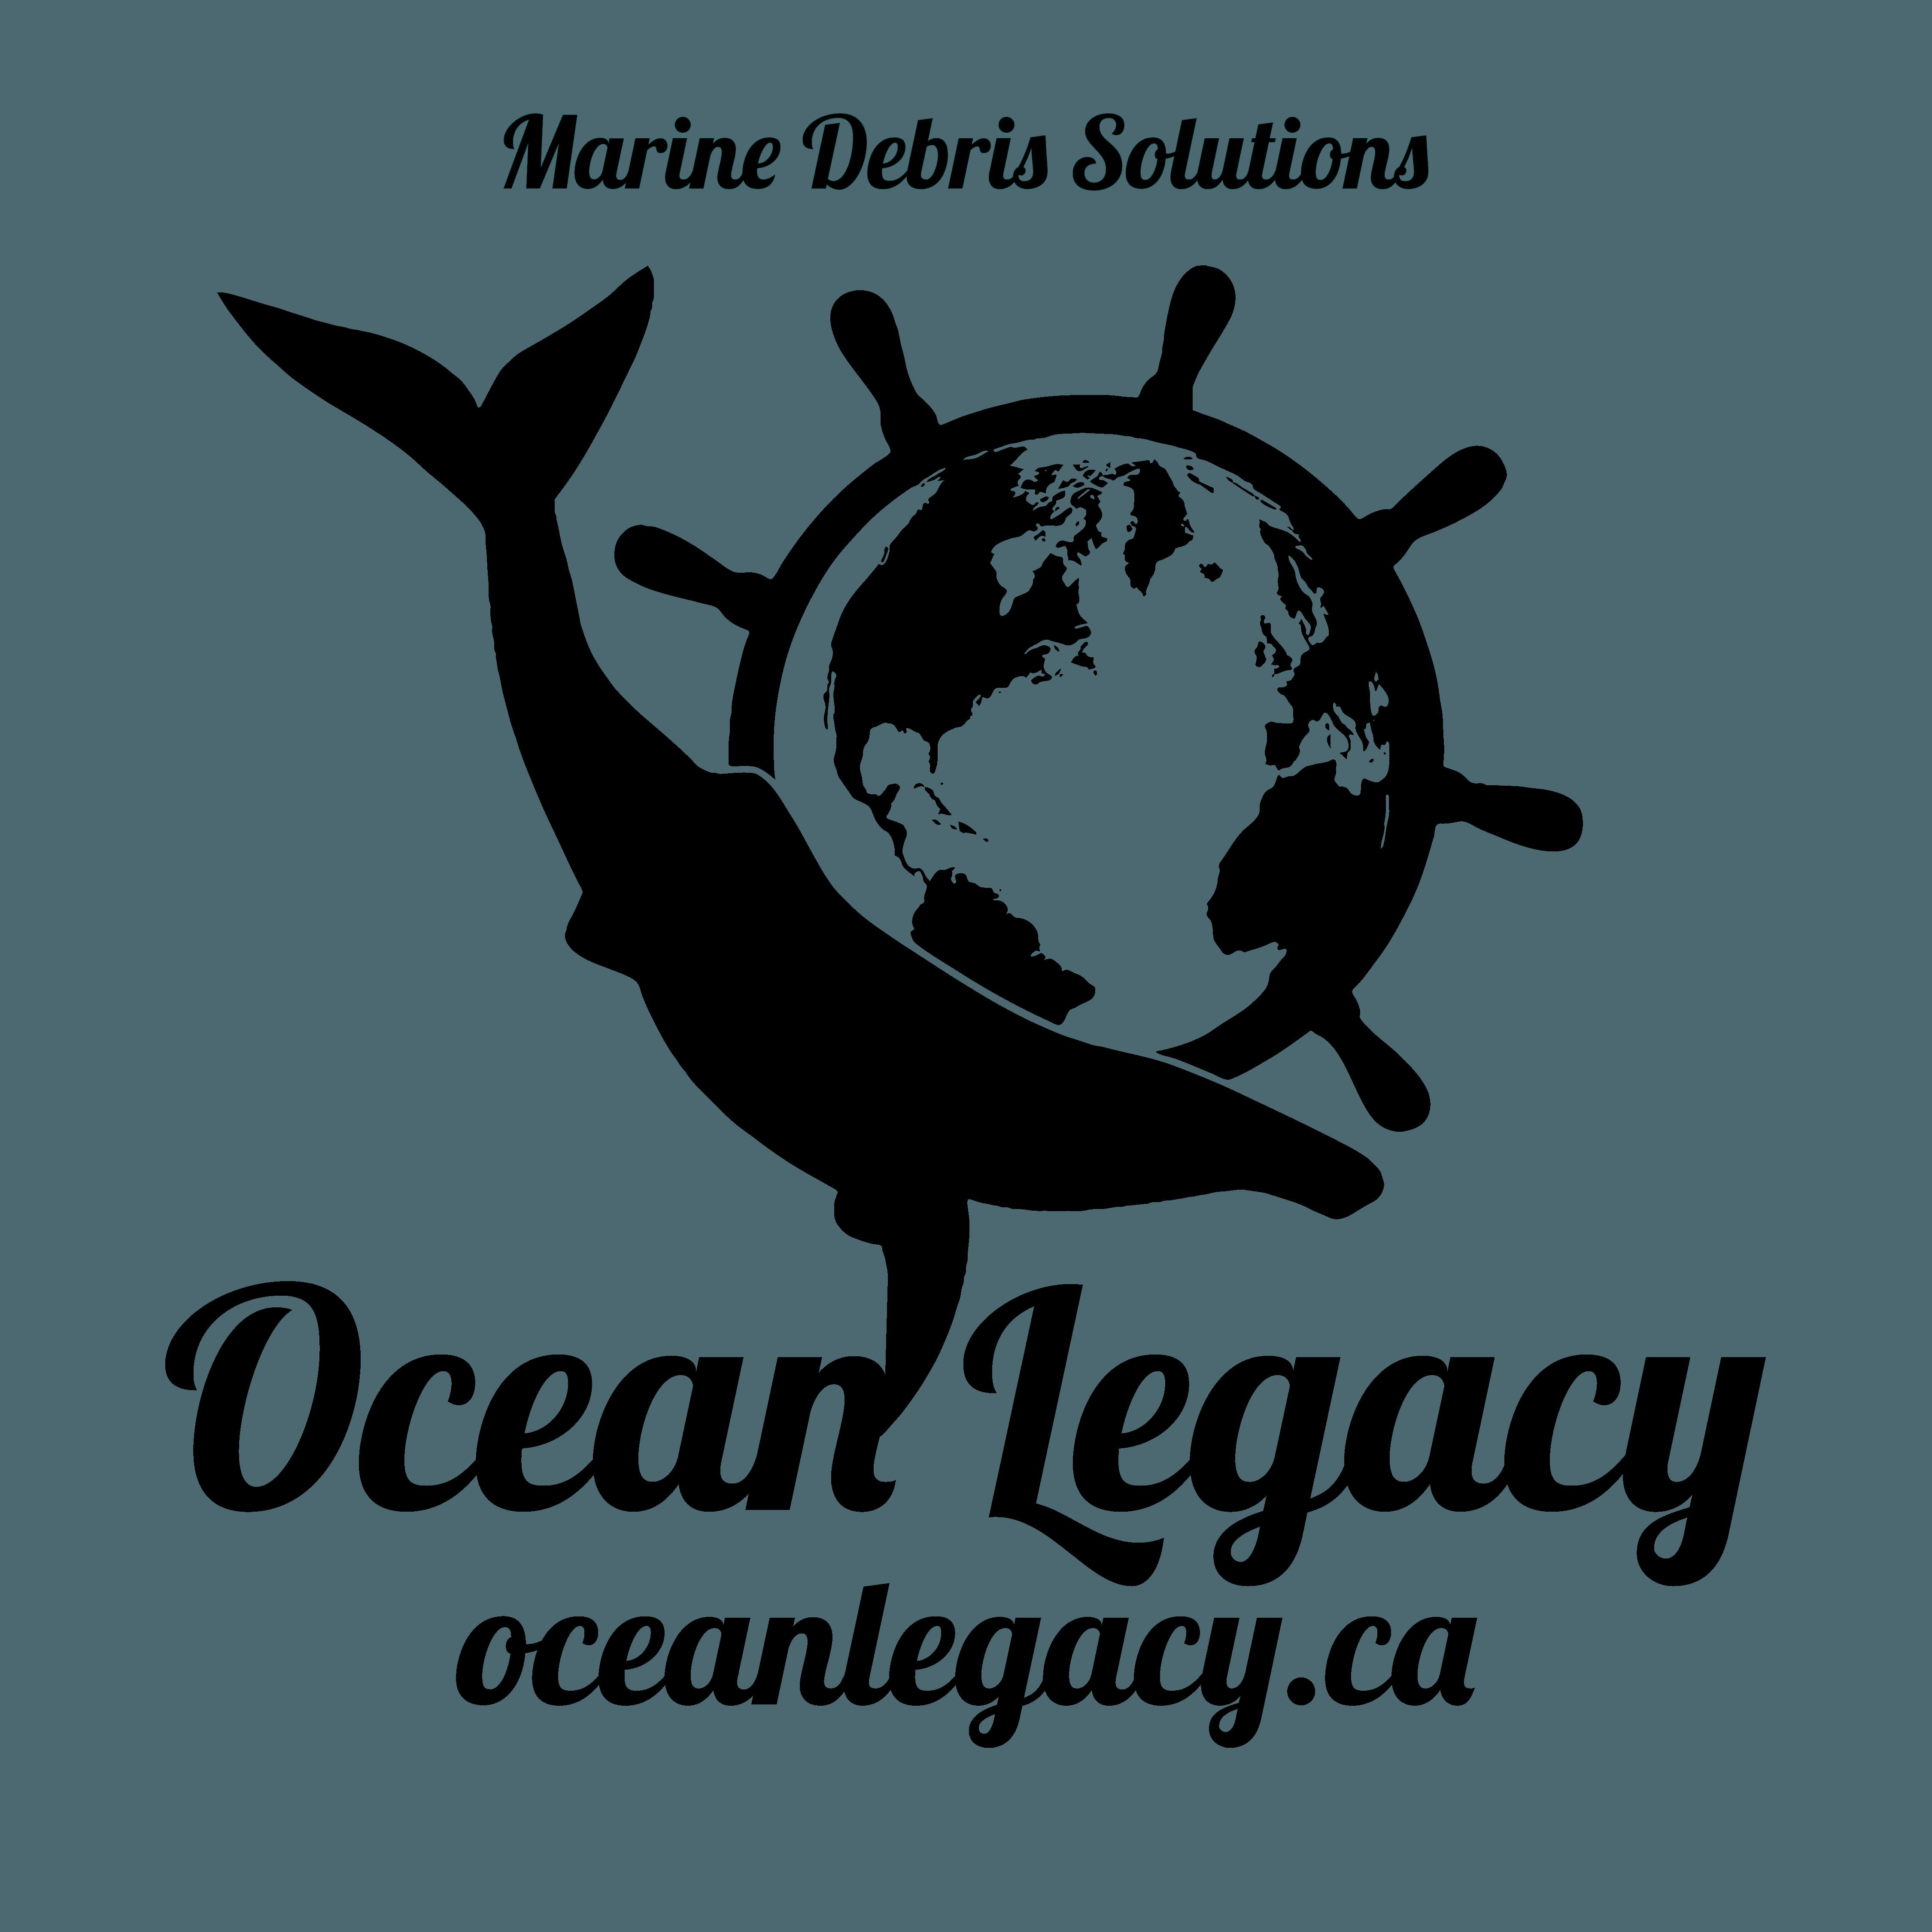 The Ocean Legacy Foundation